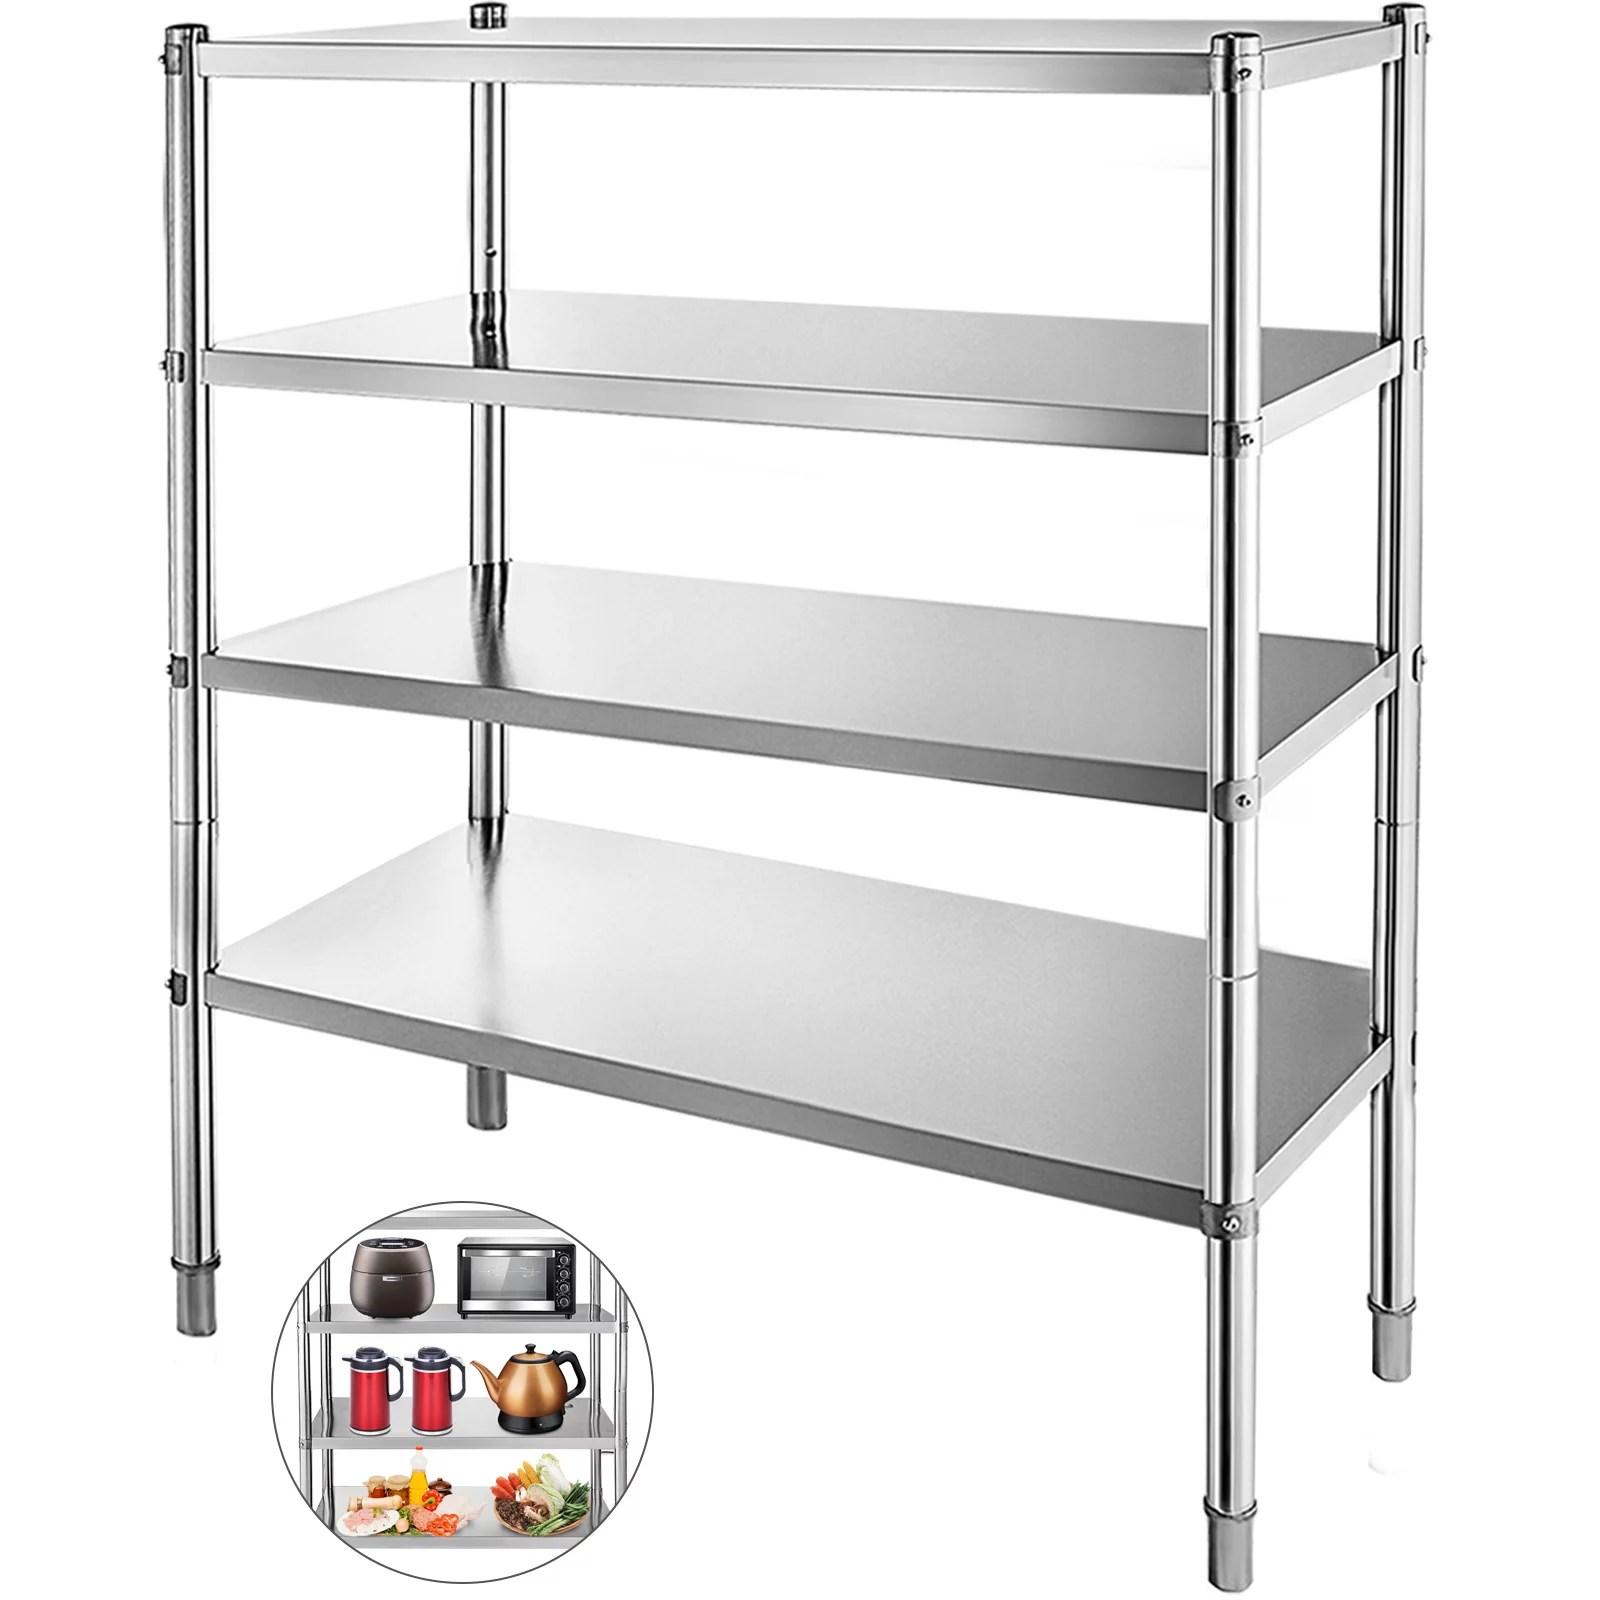 bestequip 4 tier shelf stainless steel shelving 330lb capacity per shelf commercial standing shelf unit display rack for kitchen office garage